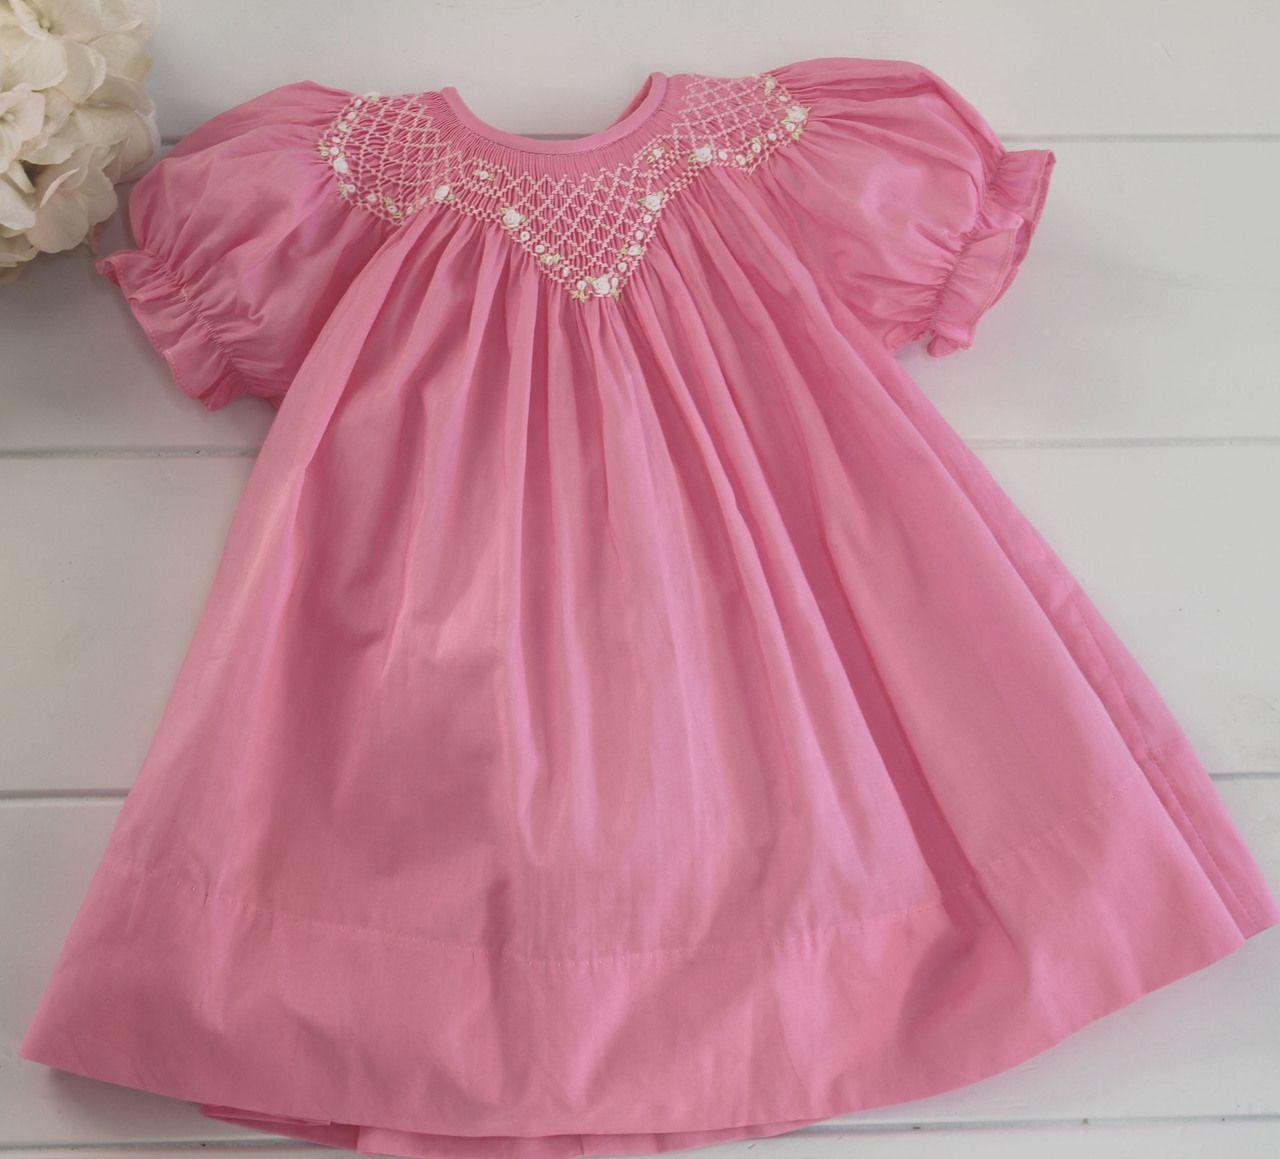 faeeb6abeb1d Hiccups Childrens Boutique - Girls Hot Pink Smocked Bishop Dress Rosalina,  $46.00 (https: